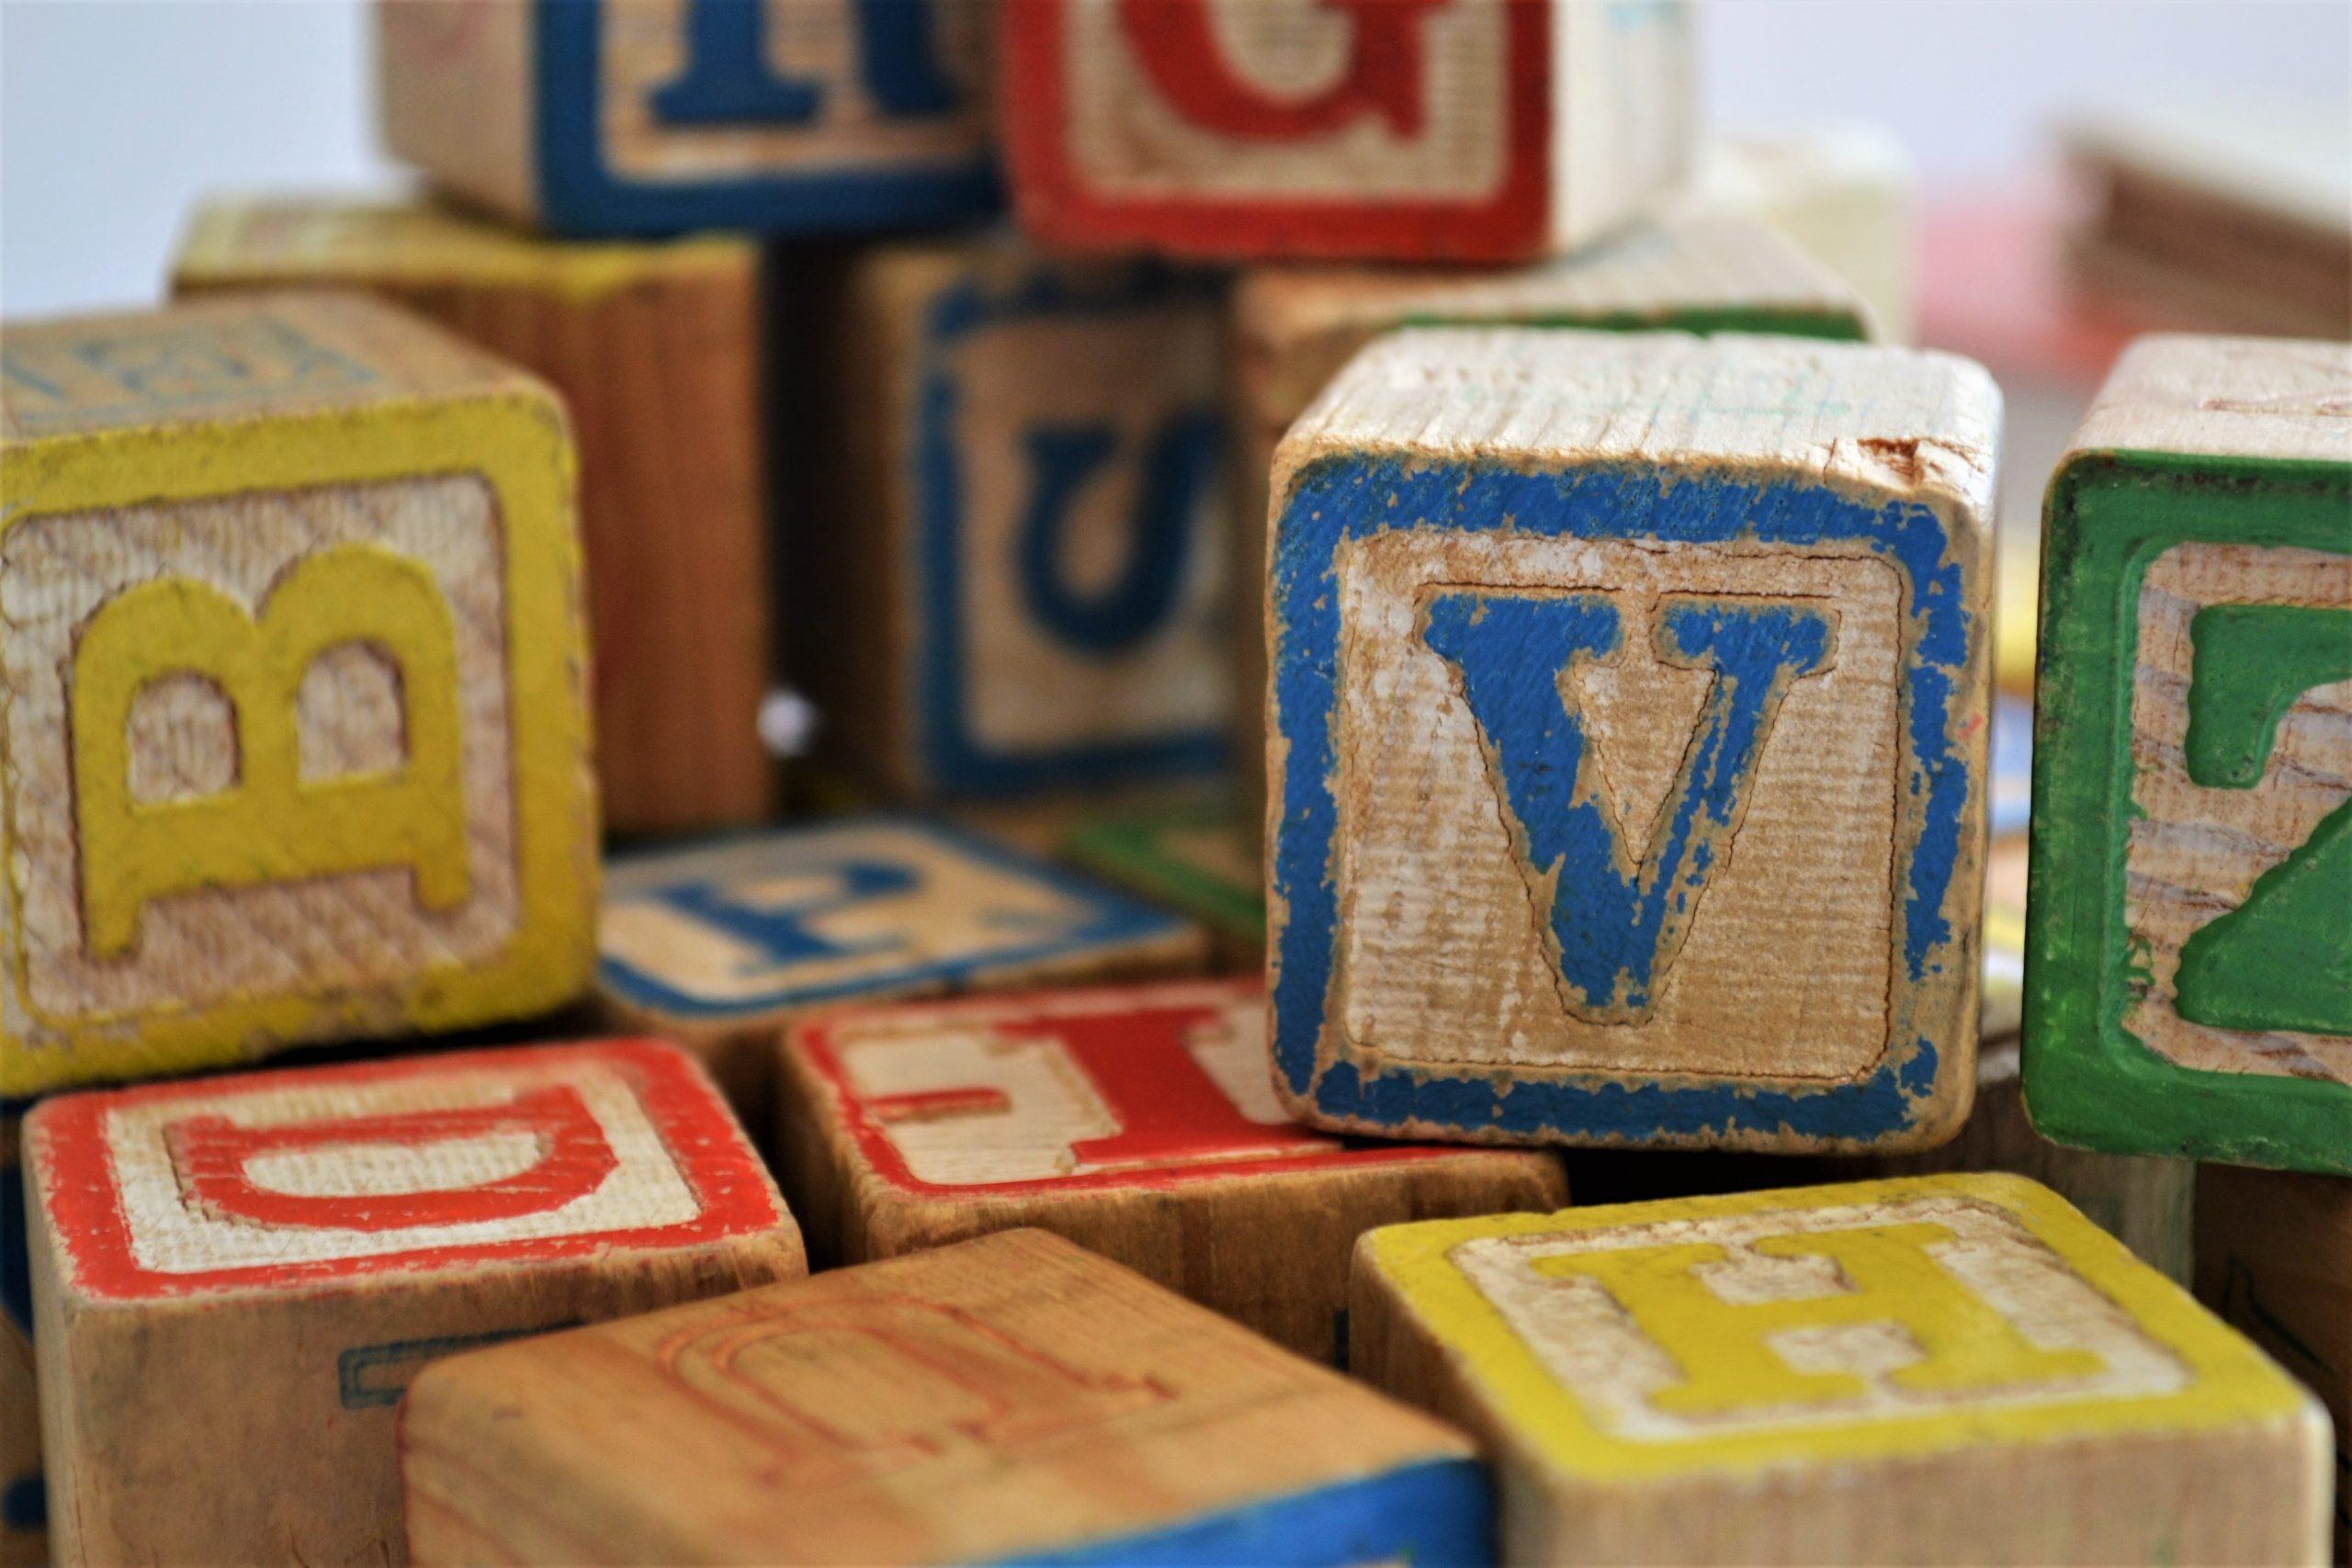 Alphabet Blocks to show how Inclusive Language Create Belonging